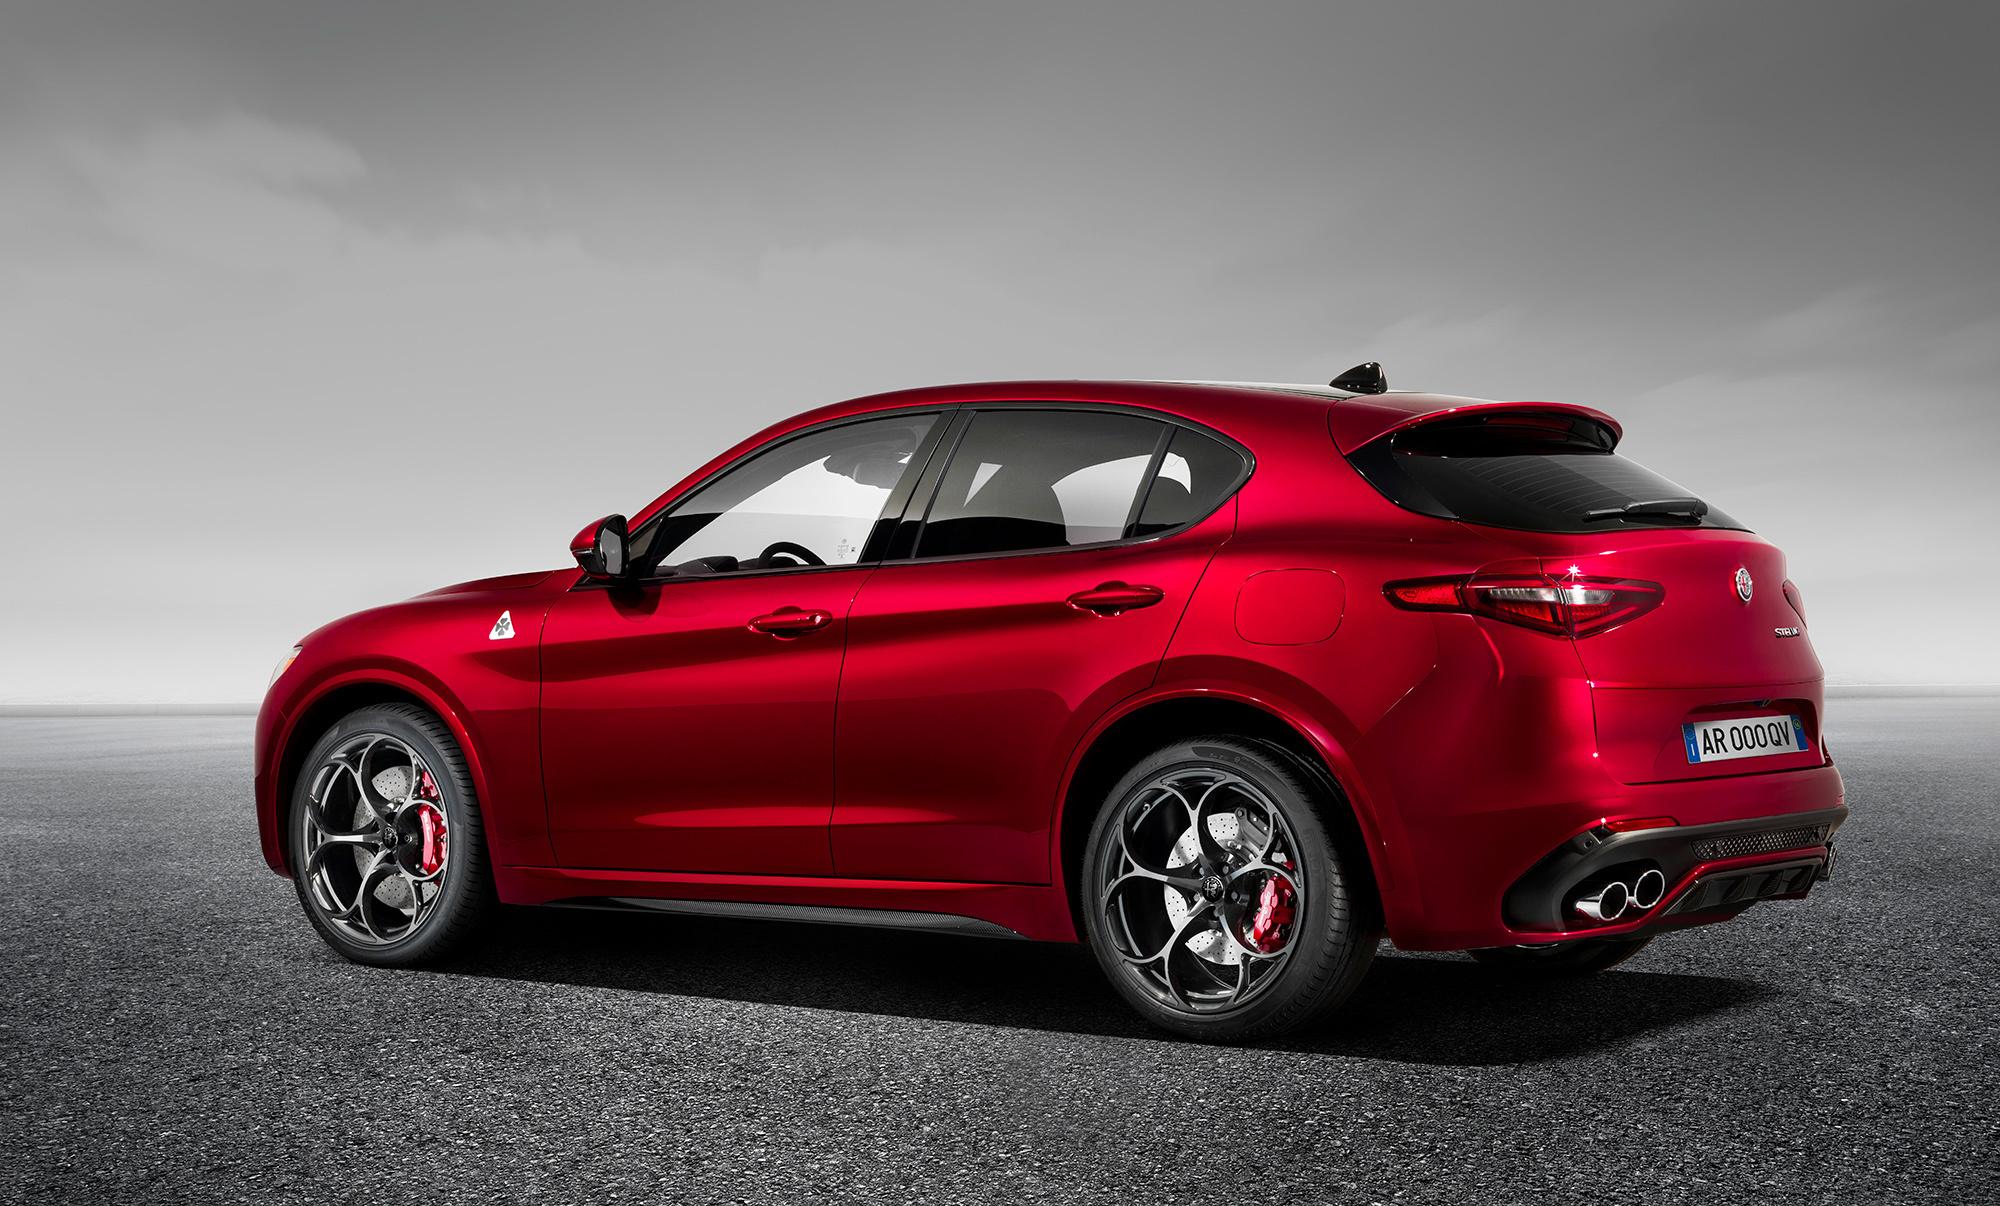 Alfa Romeo Stelvio Free Images